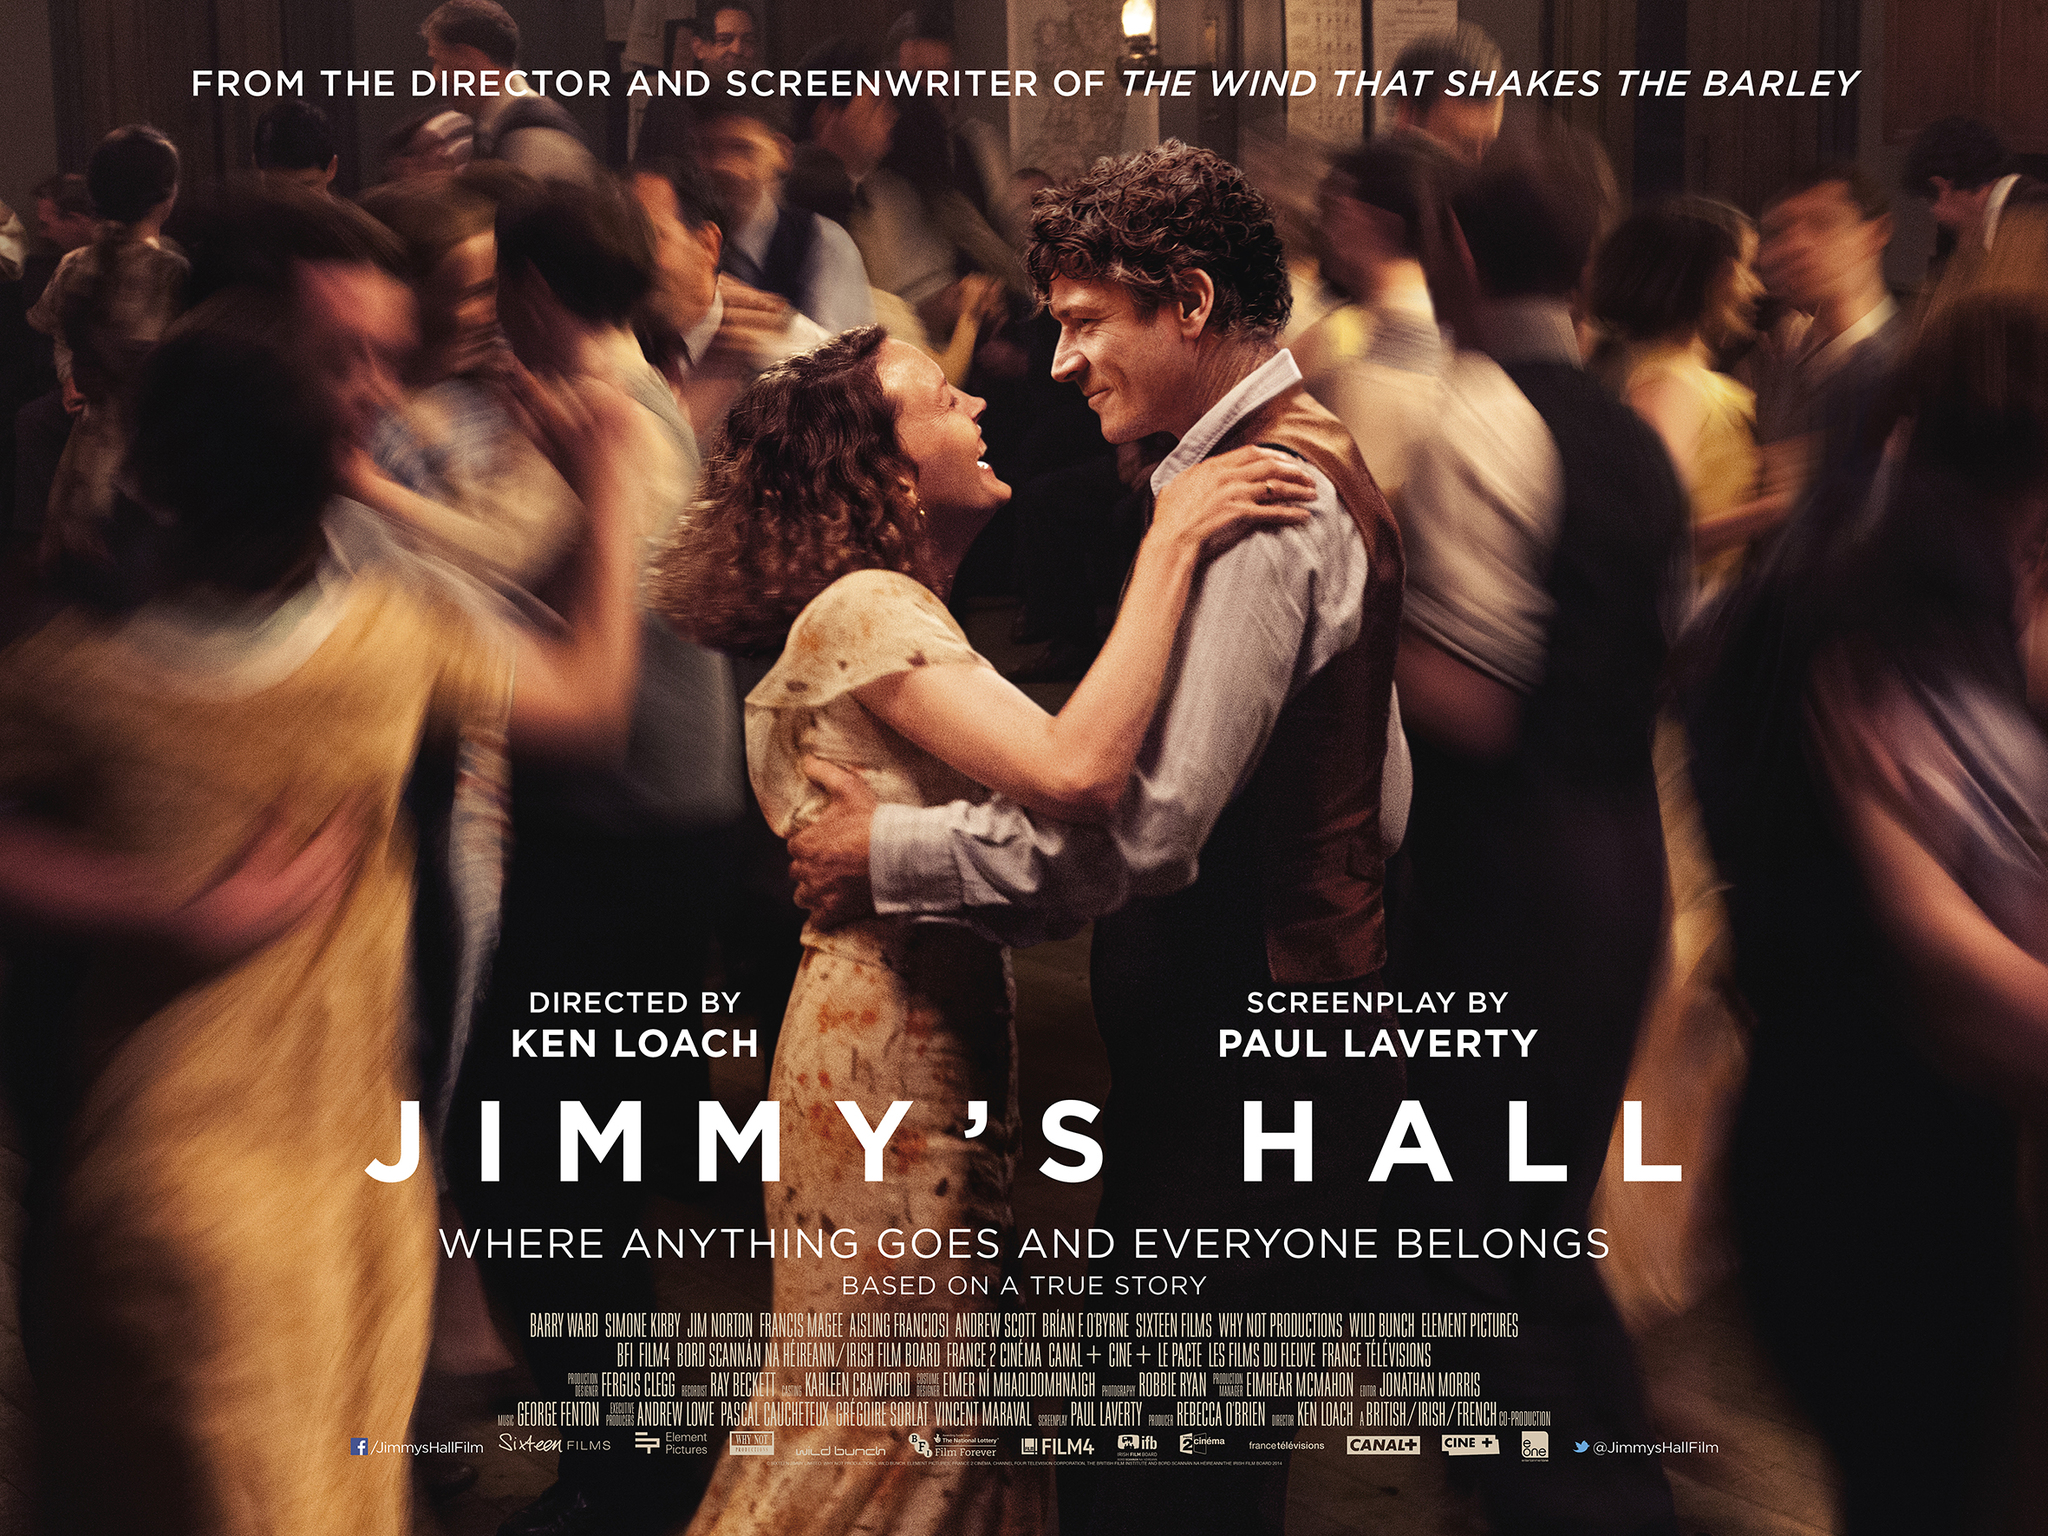 http://www.heyuguys.com/images/2014/04/Jimmys-Hall-Poster.jpg